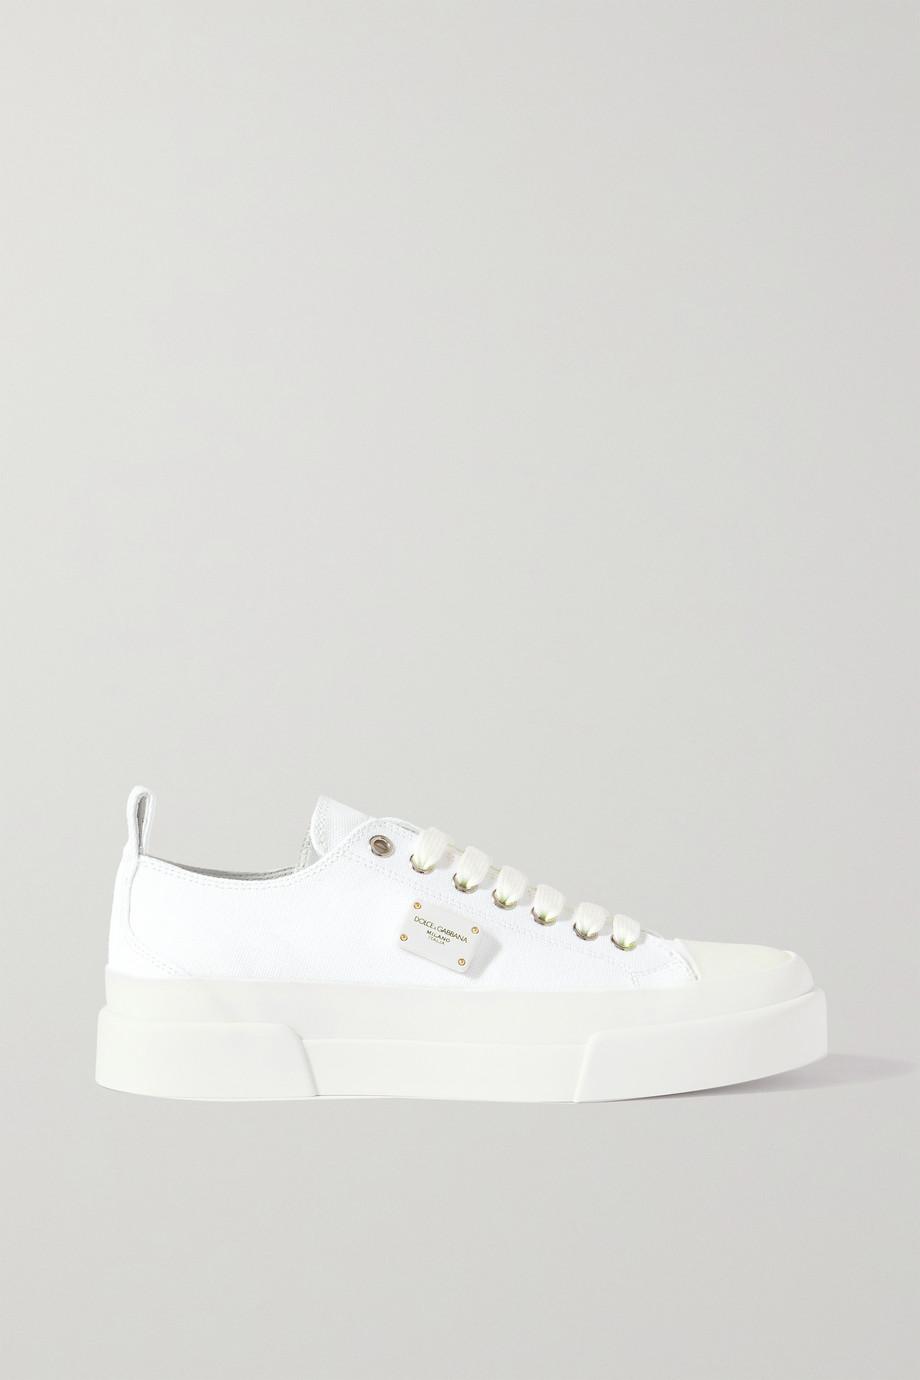 Dolce & Gabbana Portofino Light logo-embellished leather-trimmed canvas sneakers